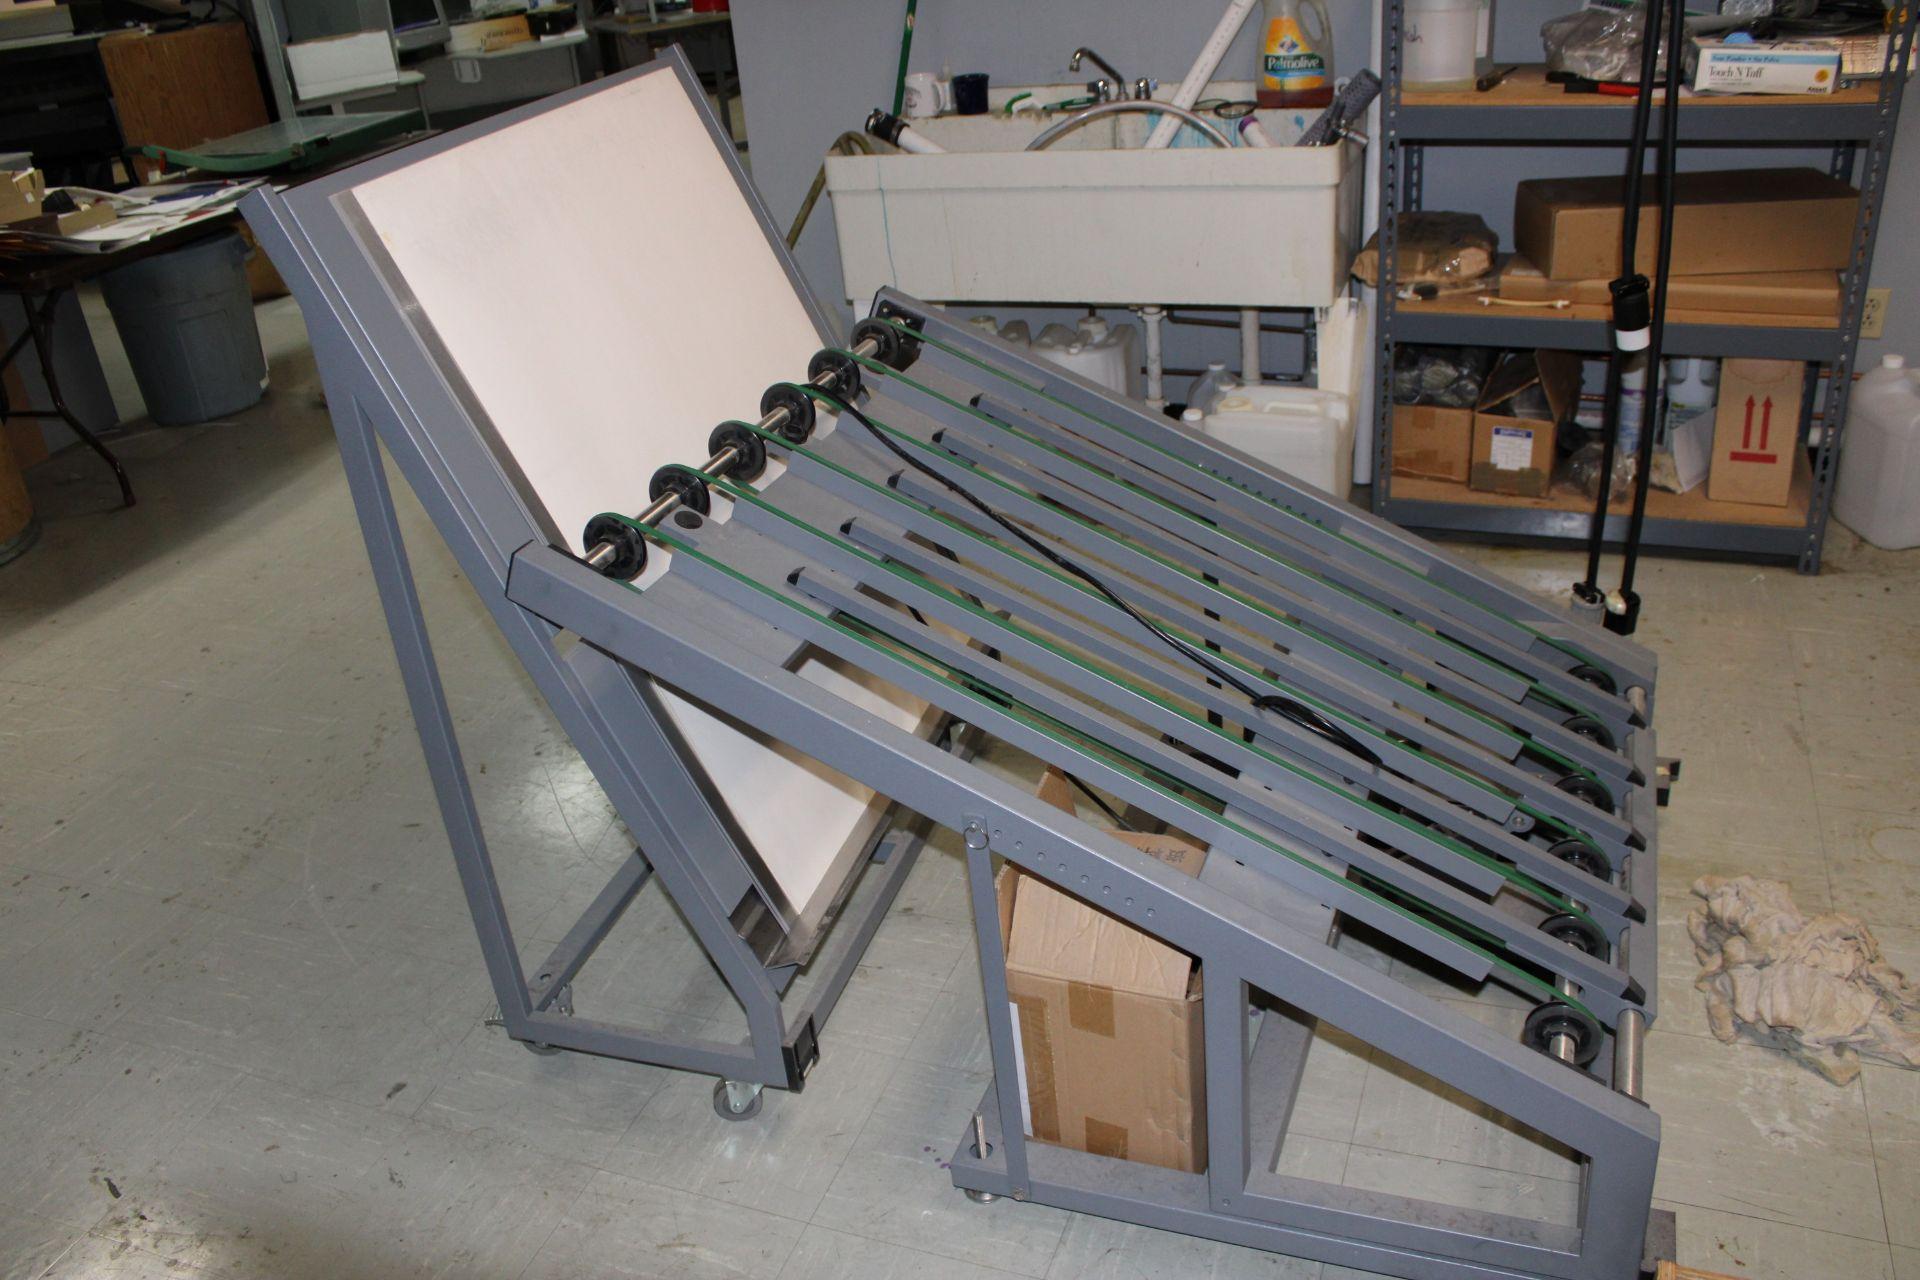 Lot 24 - 2011 Kodak Model Magnus 800 Plate Setters s/n M81479